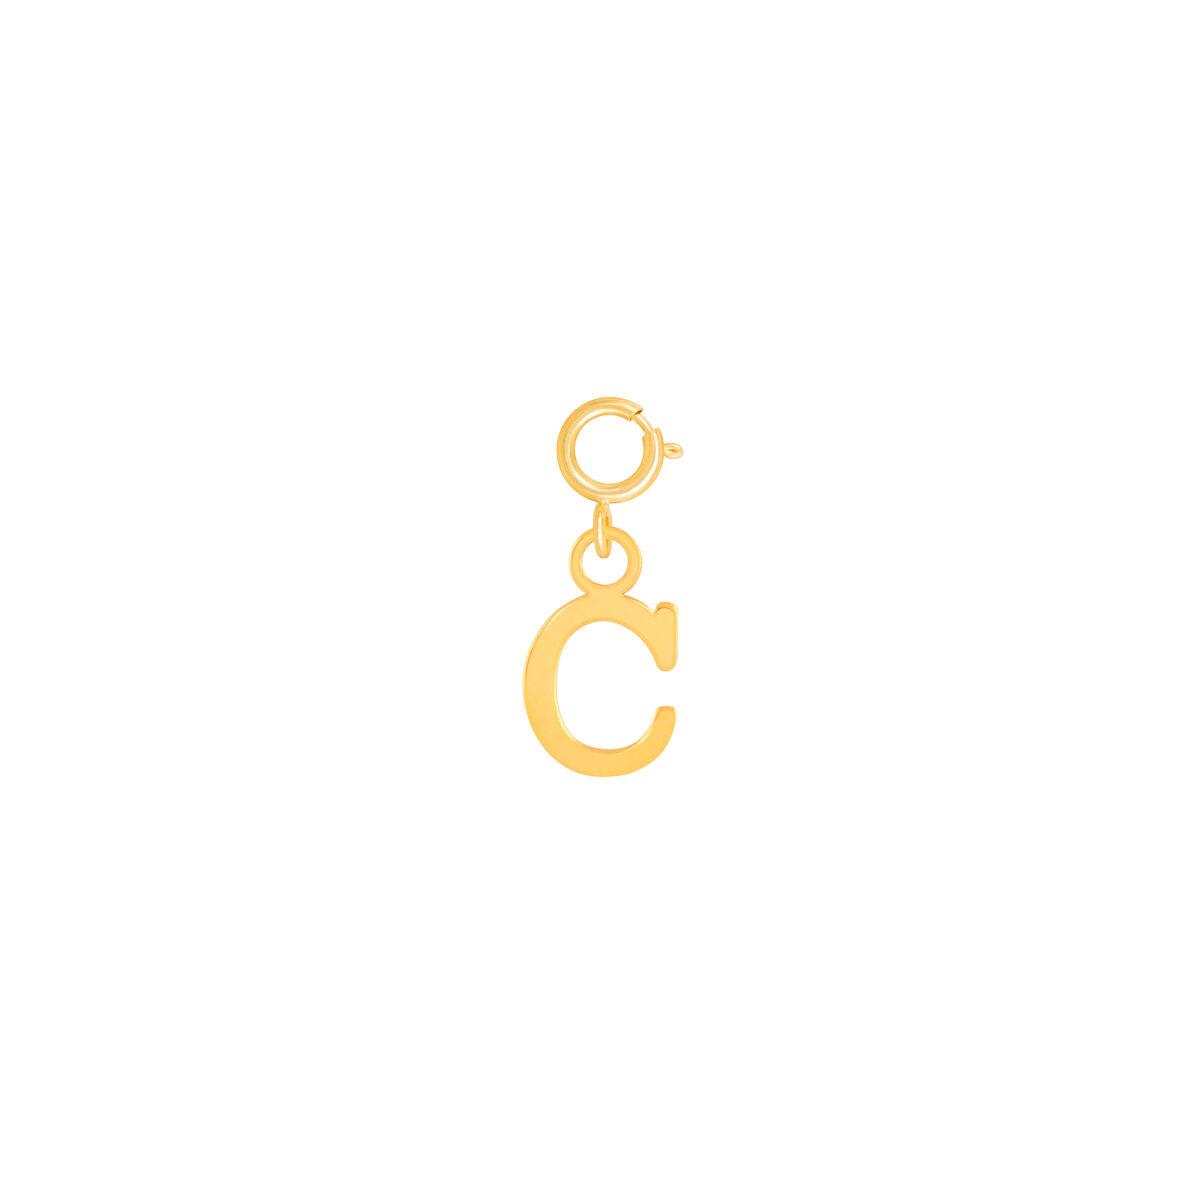 آویز طلا حرف C